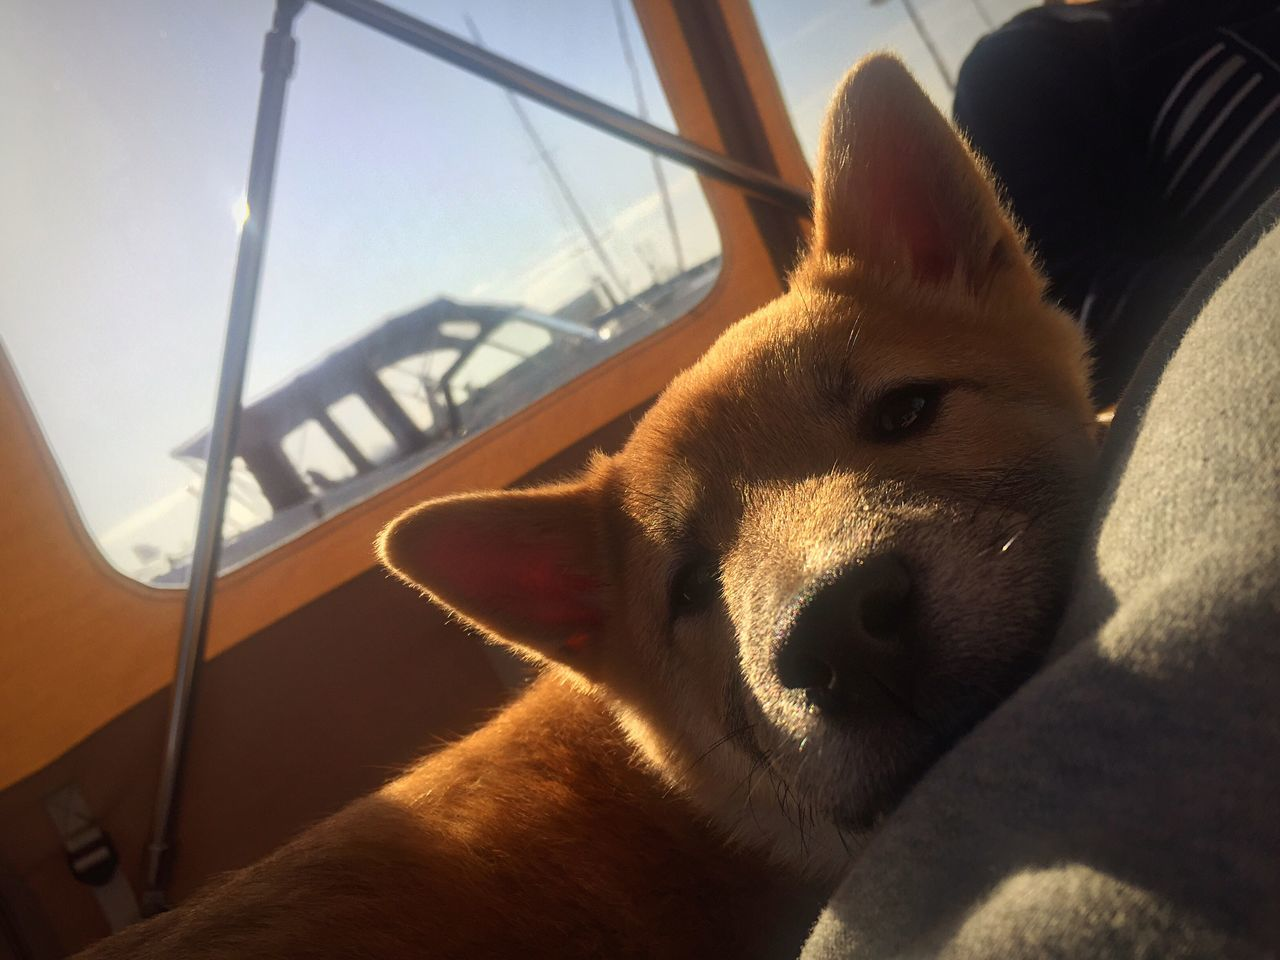 Simba in the sun on a boat. Sun Boat Jacht Shibainu Simba Lionking The City Light EyeEmNewHere Dog